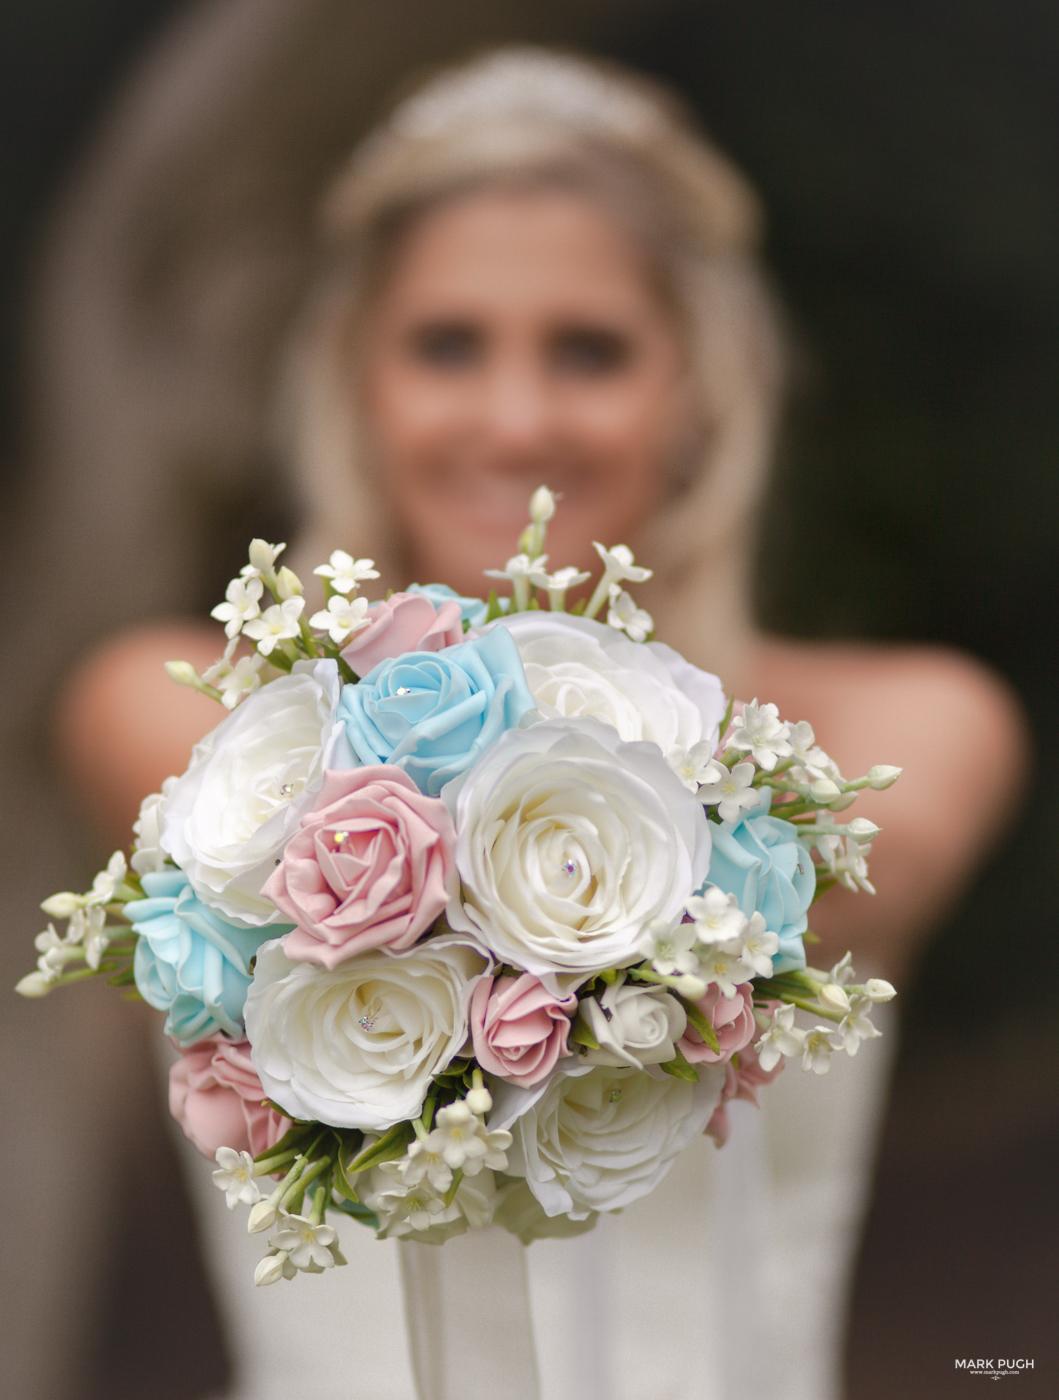 226 Wedding Photography Award winning Wedding Photographer and Videographer Mark Pugh www.markpugh.com.JPG